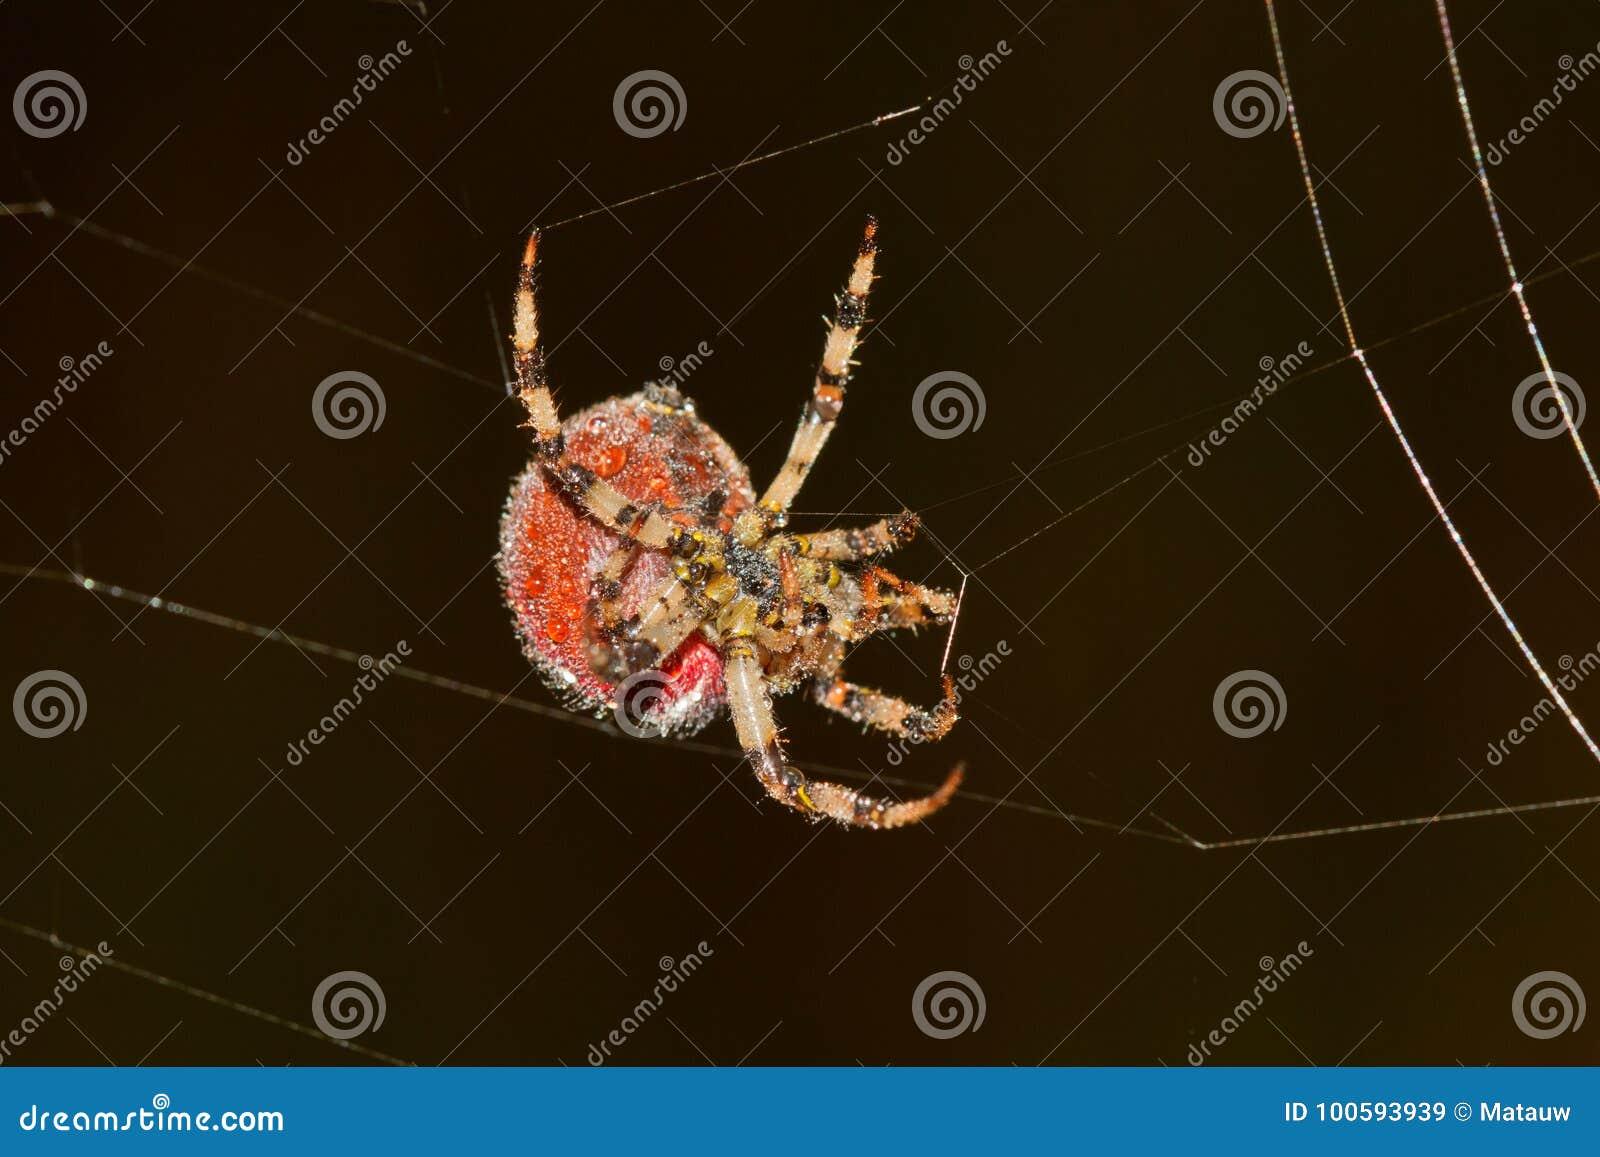 Big spider weaving web stock image. Image of creepy - 100593939